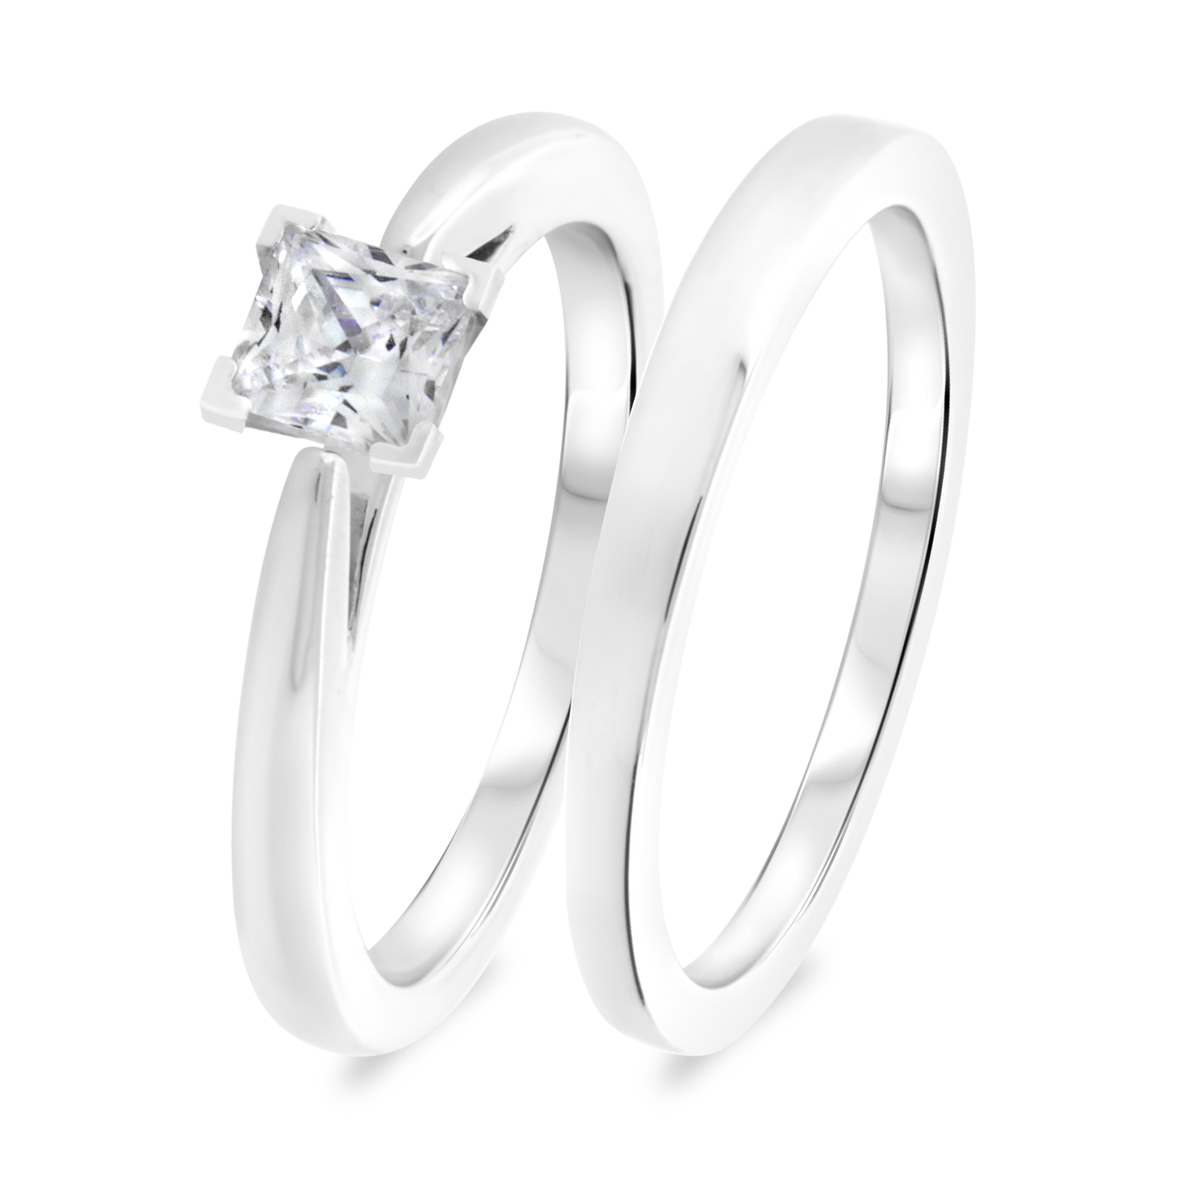 1 CT. T.W. Diamond Women's Bridal Wedding Ring Set 14K White Gold